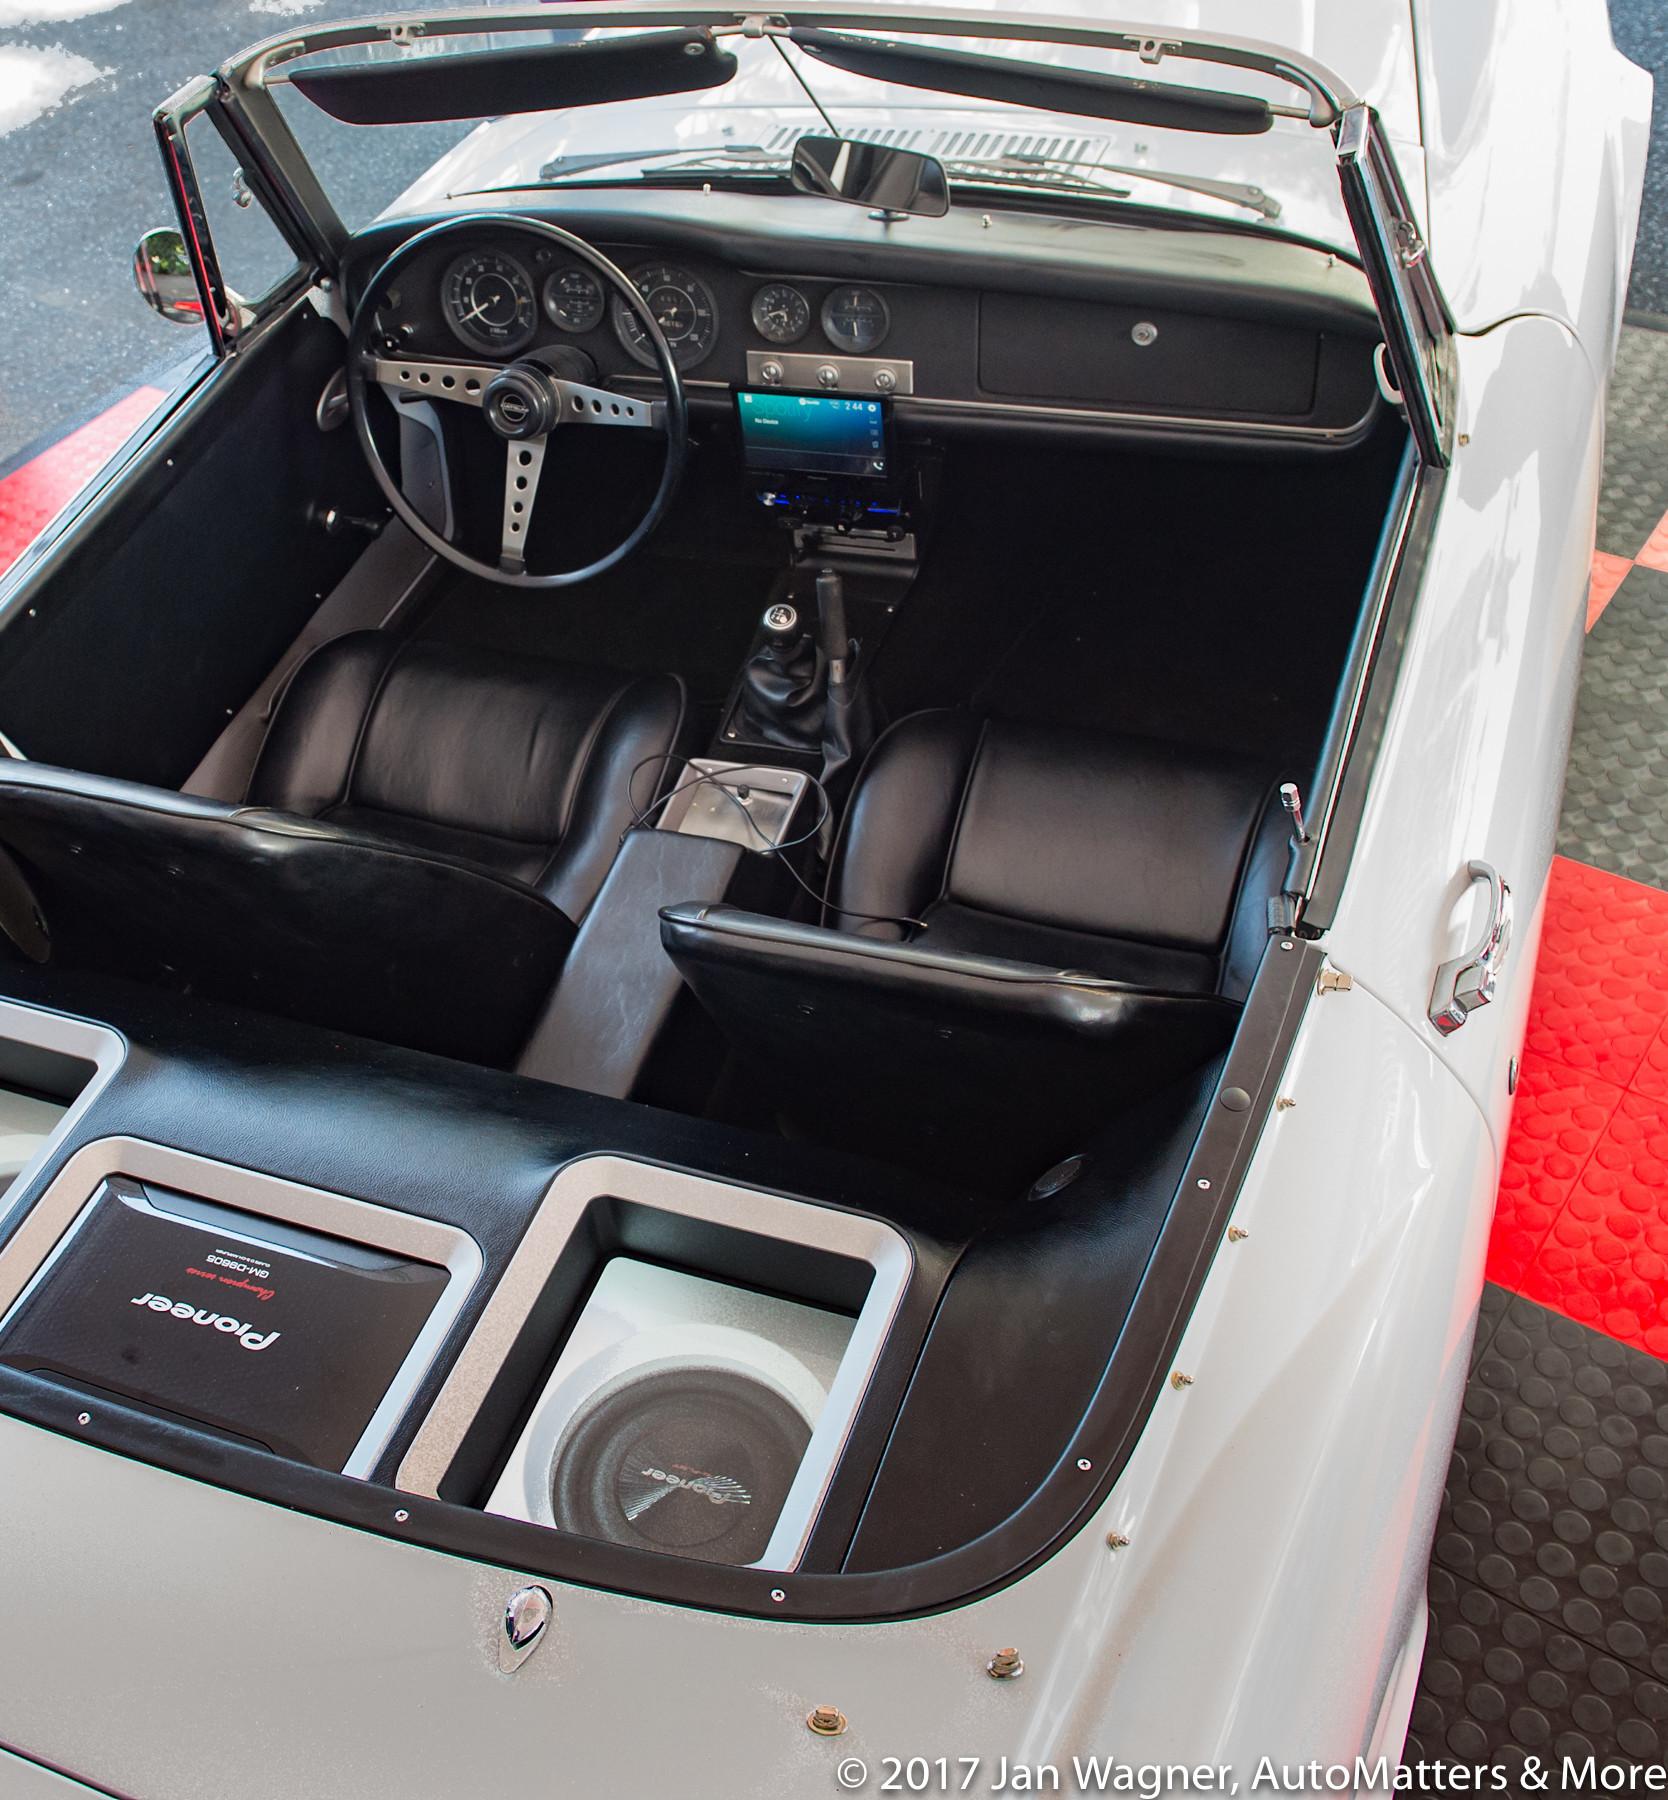 Pioneer AVH-3300NEX installed in a 60s Datsun roadster.